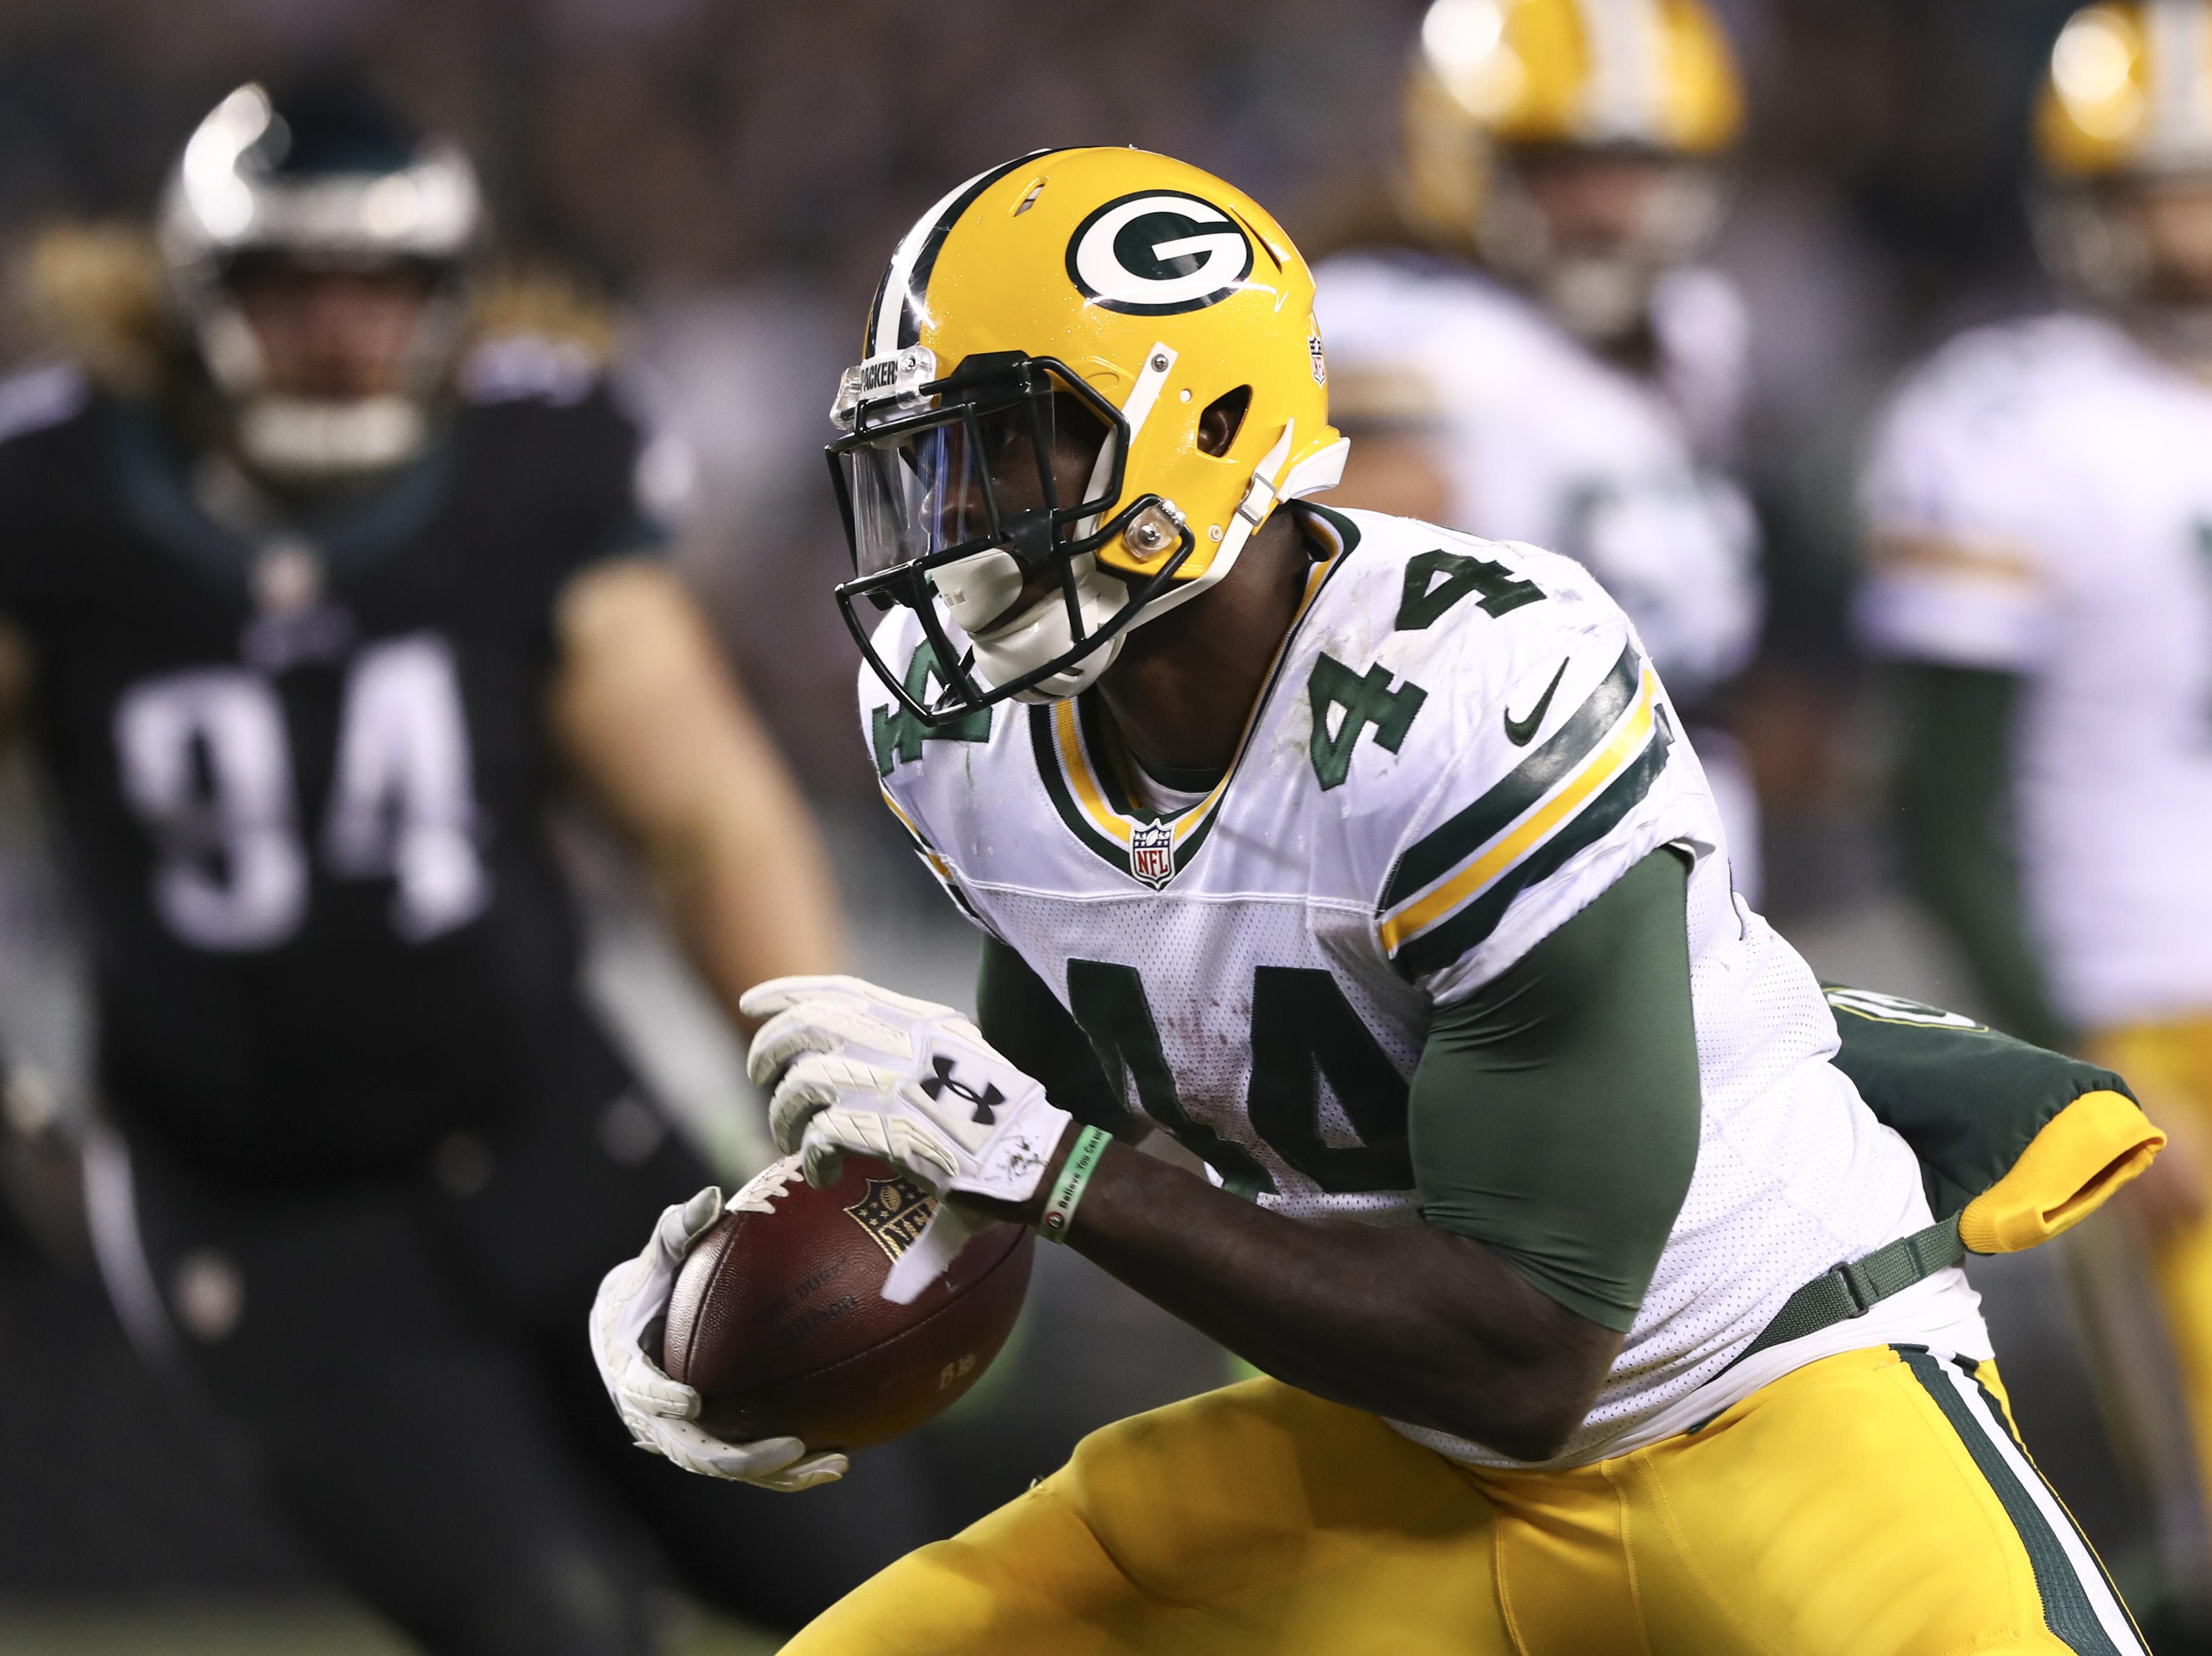 Niagara Falls native James Starks had an injury-plagued 2016 season with the Green Bay Packers. (Getty Images)